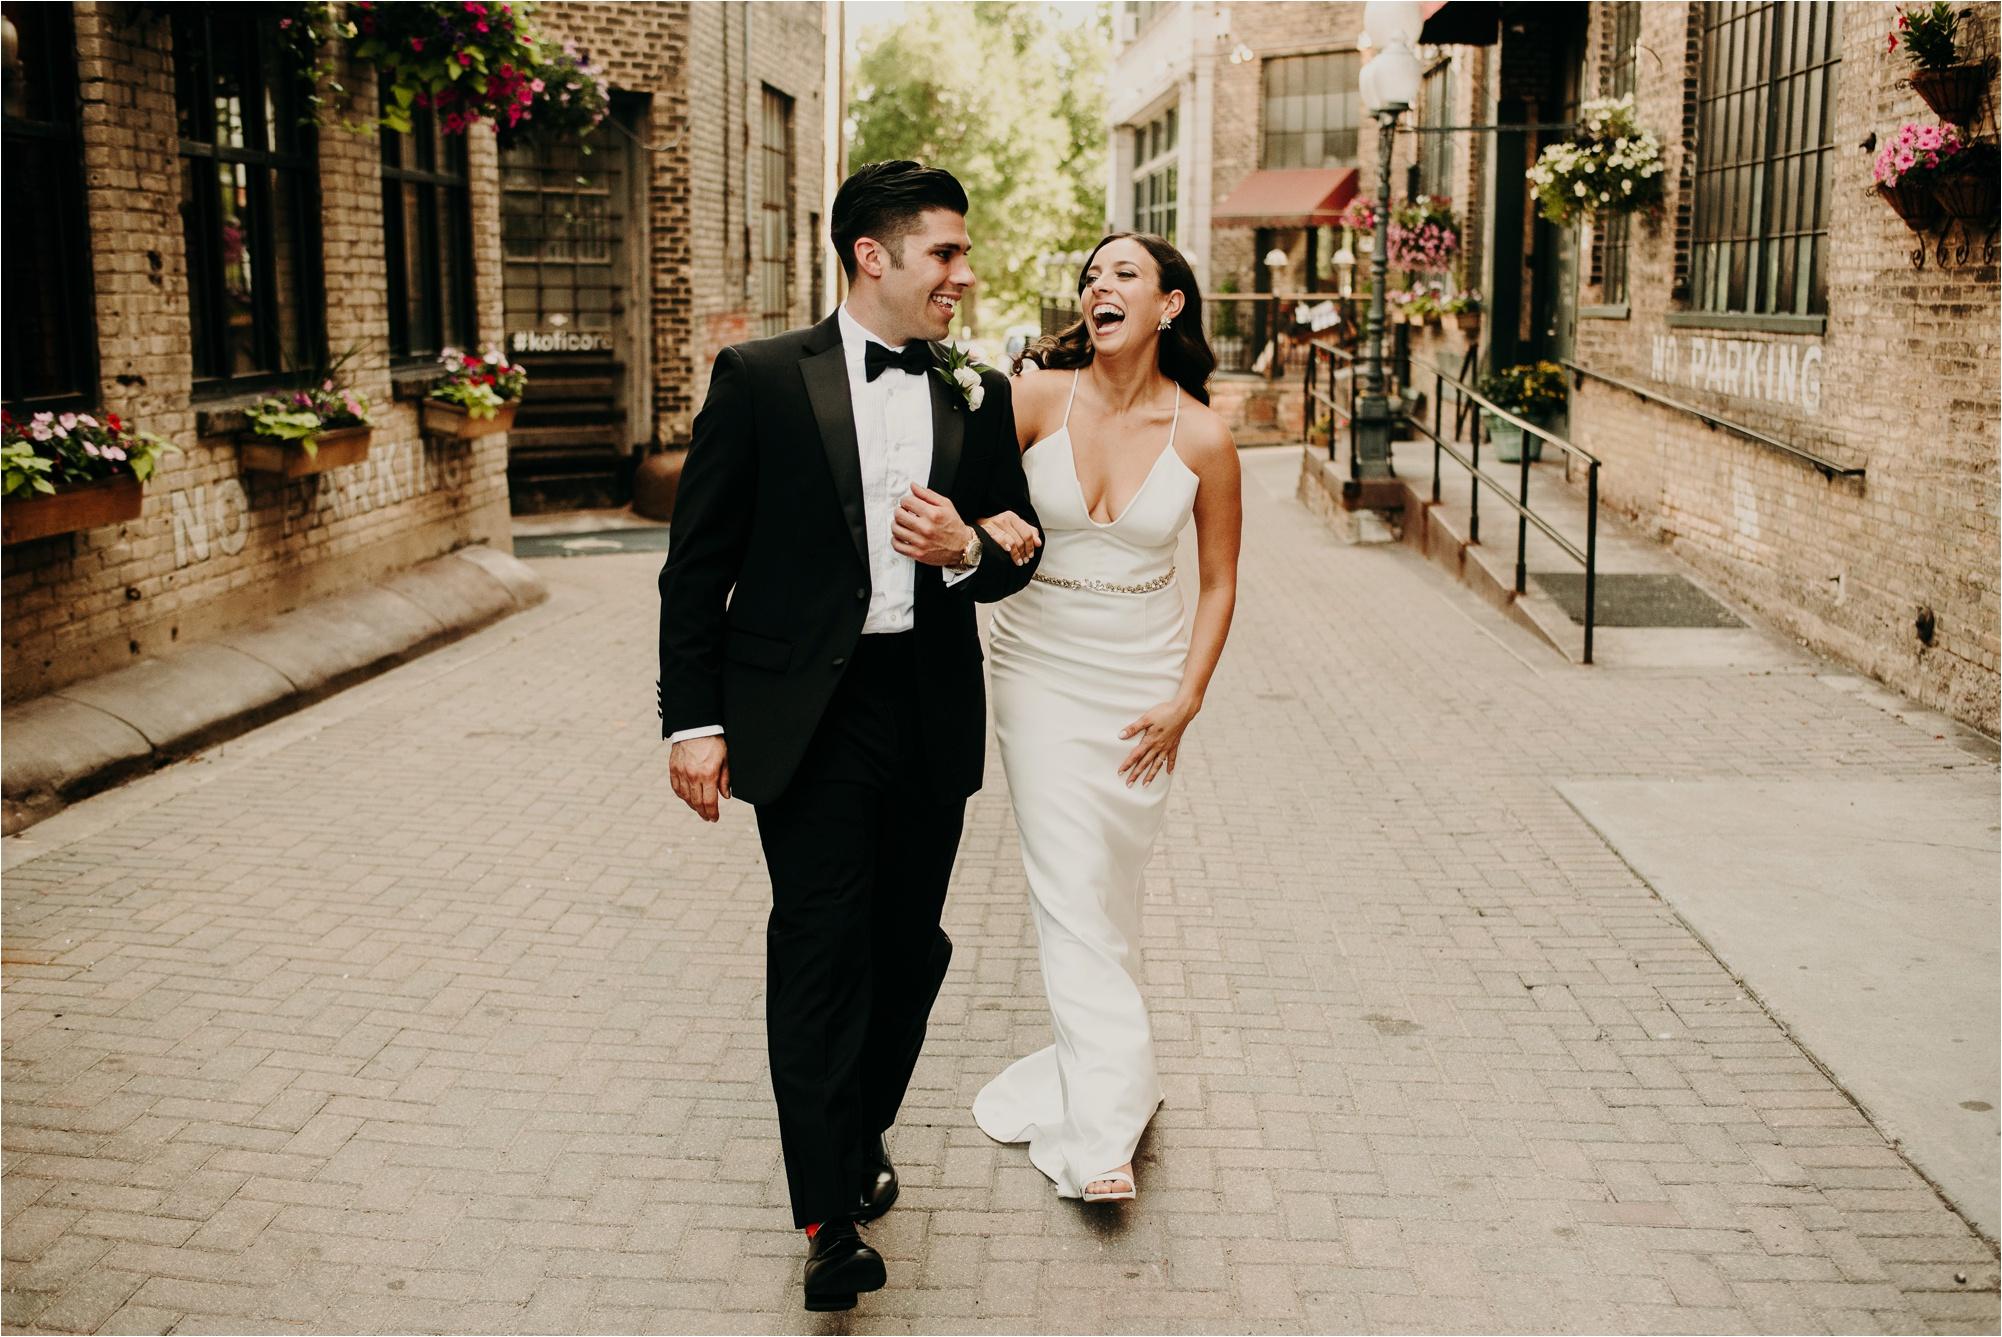 loring park minneapolis wedding photos bride and groom photographer